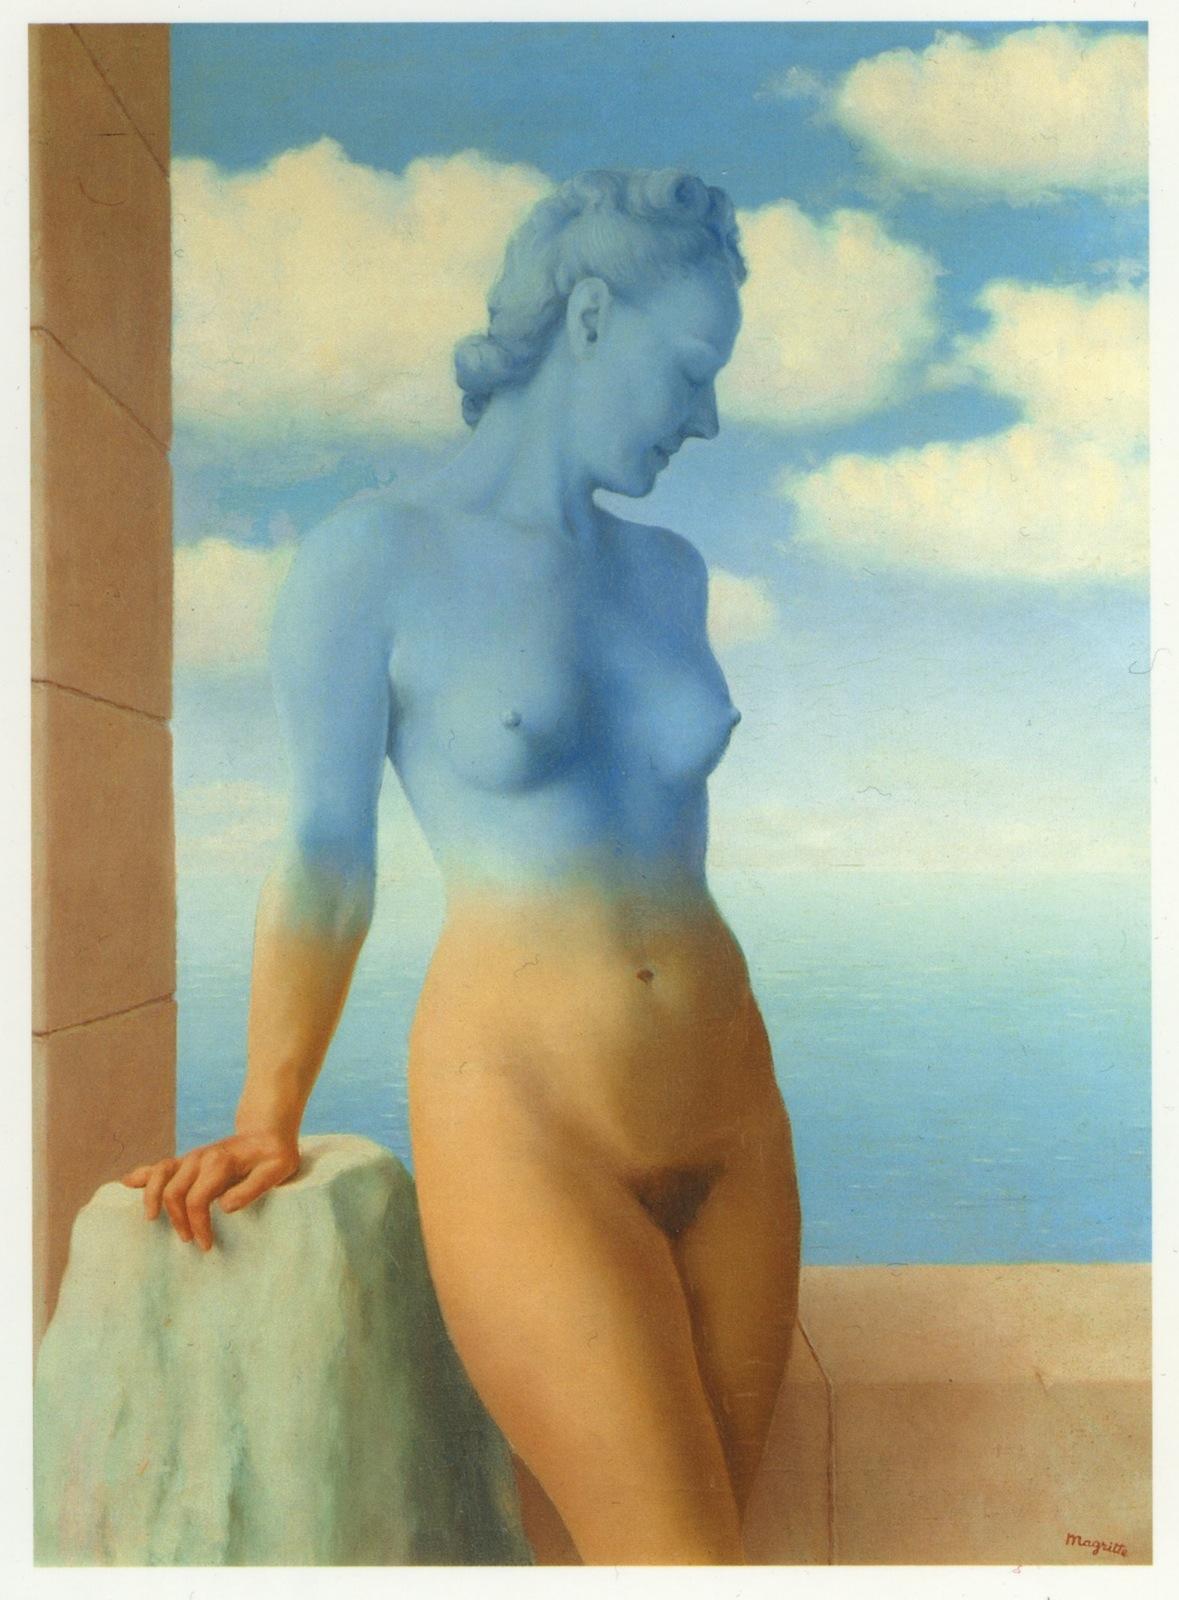 Magritte.jpeg (1179×1600)